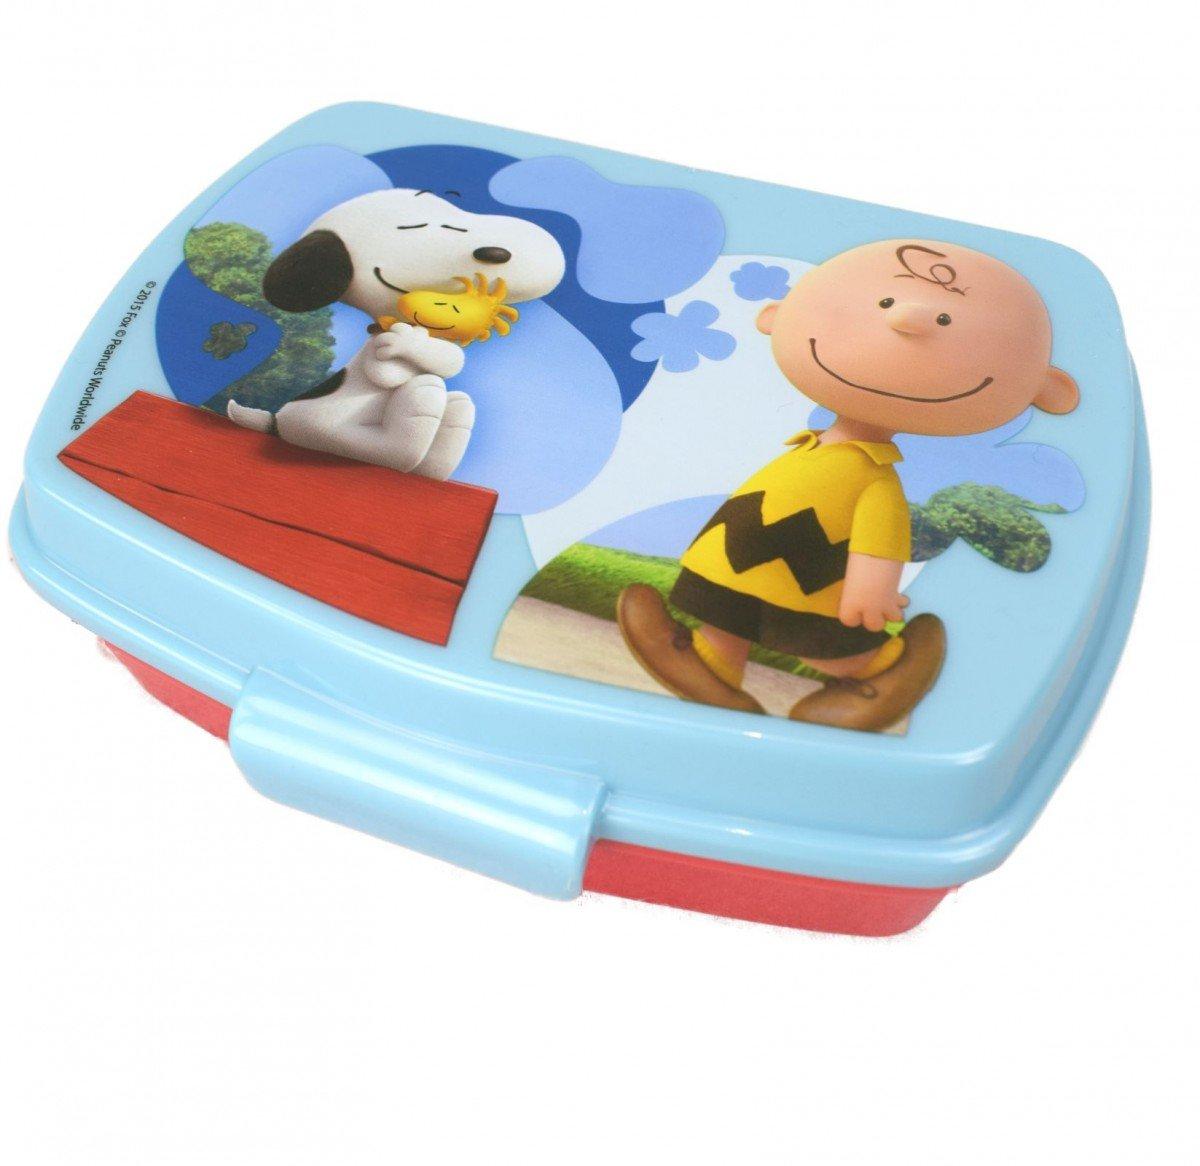 Offizielle Peanuts Snoopy und Charlie Brown Sandwich Lunch Box